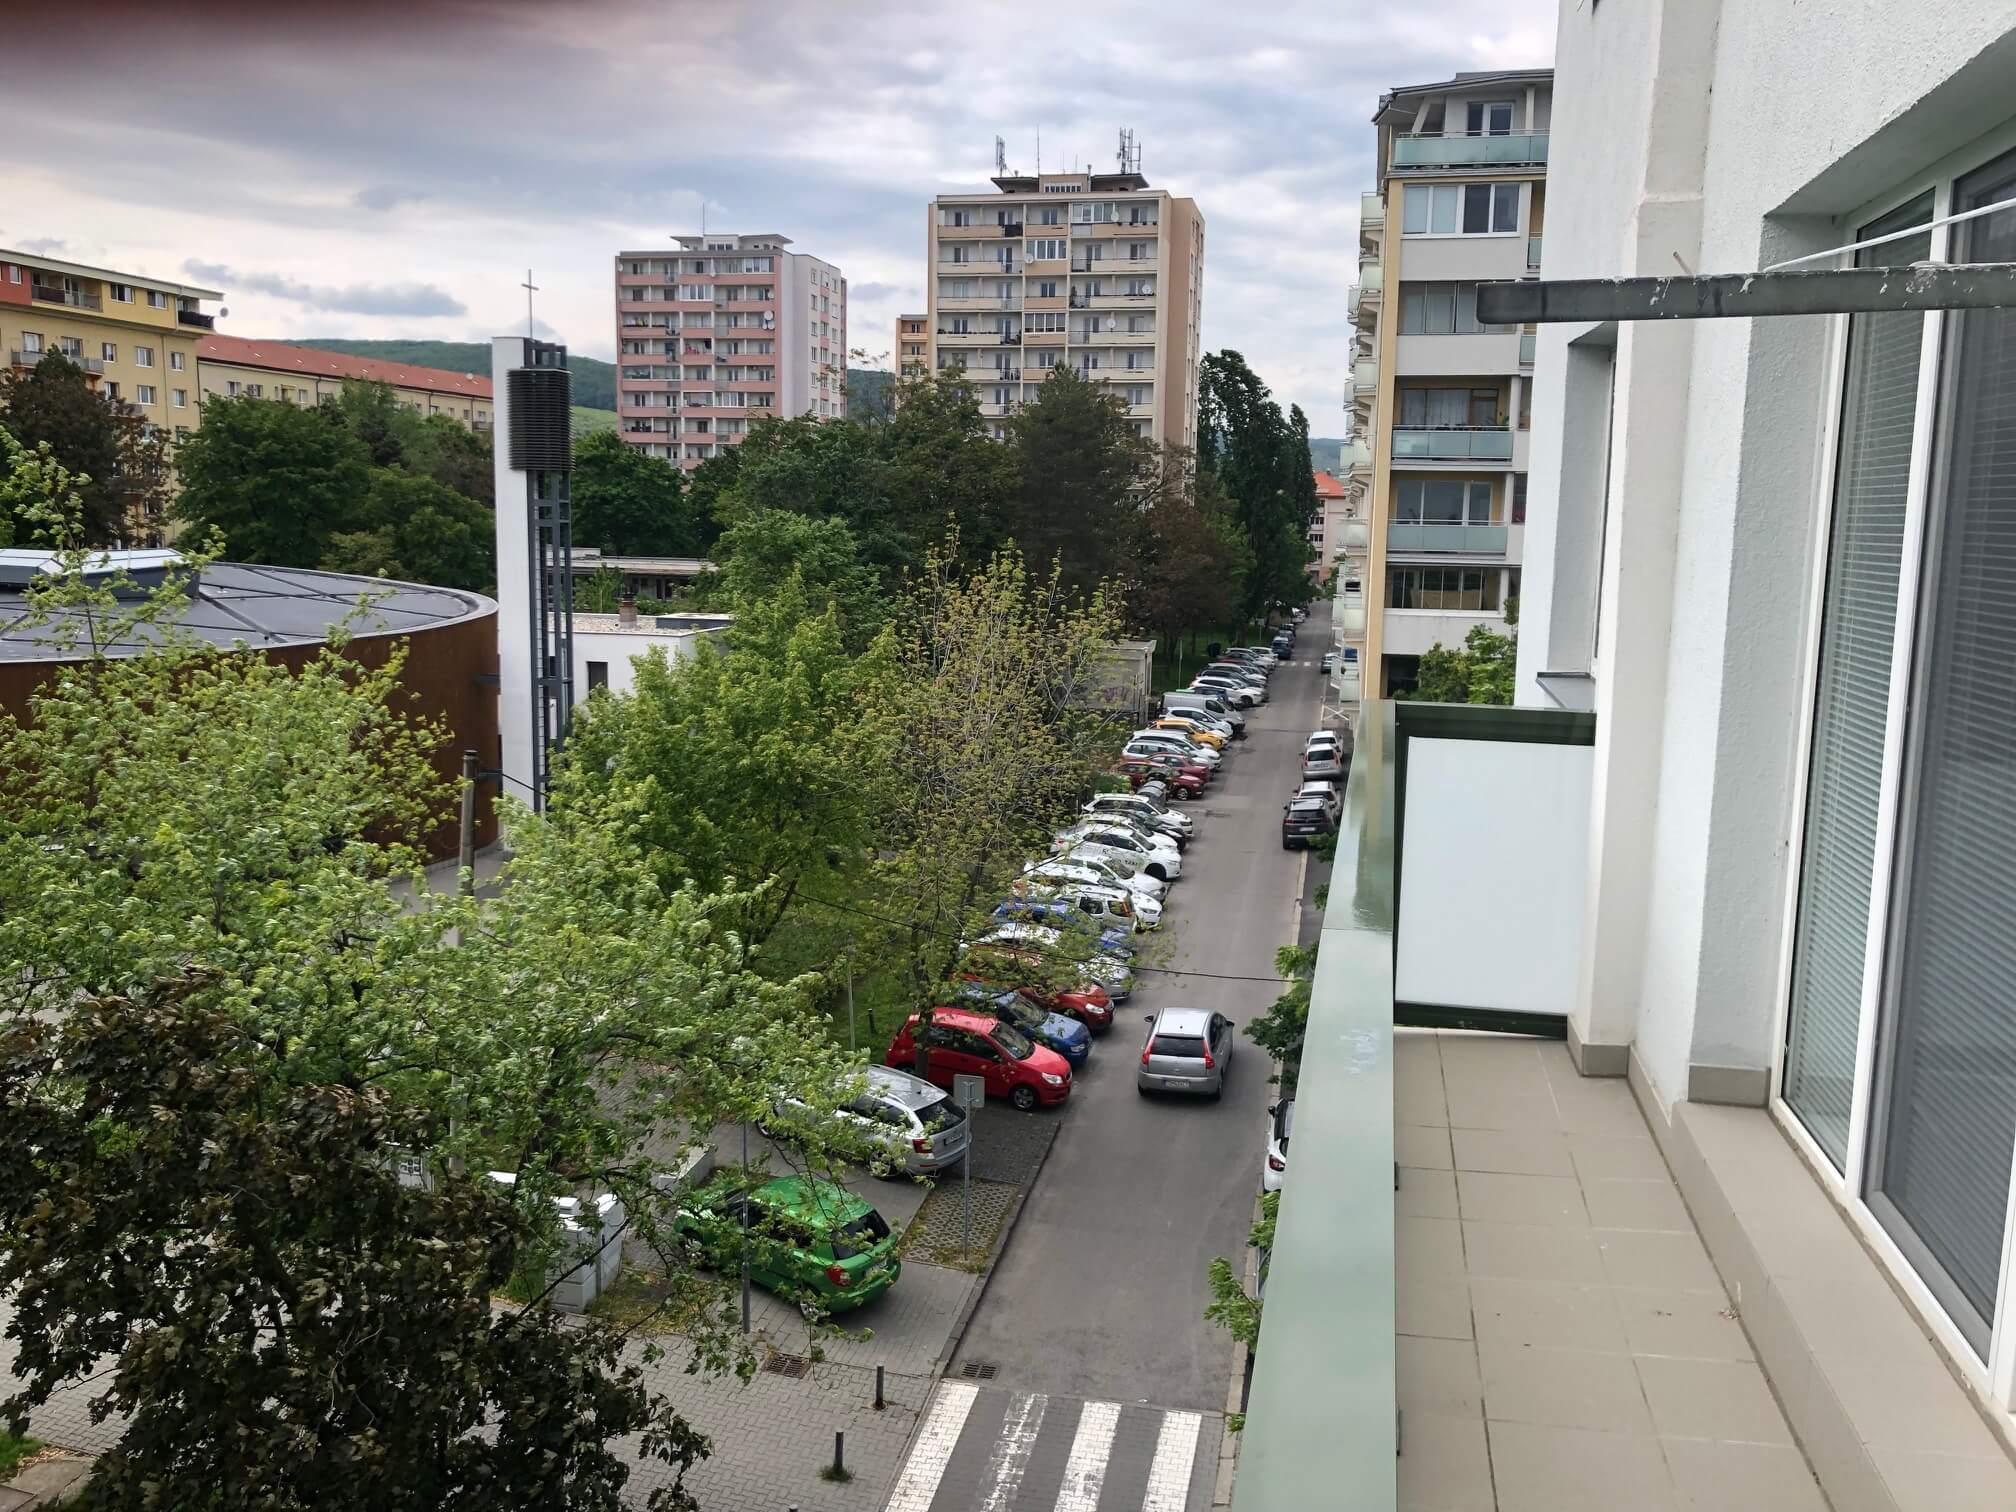 3 izbový byt, Račianska 85, 63m2, balkon 10m2, výborná lokalita-45